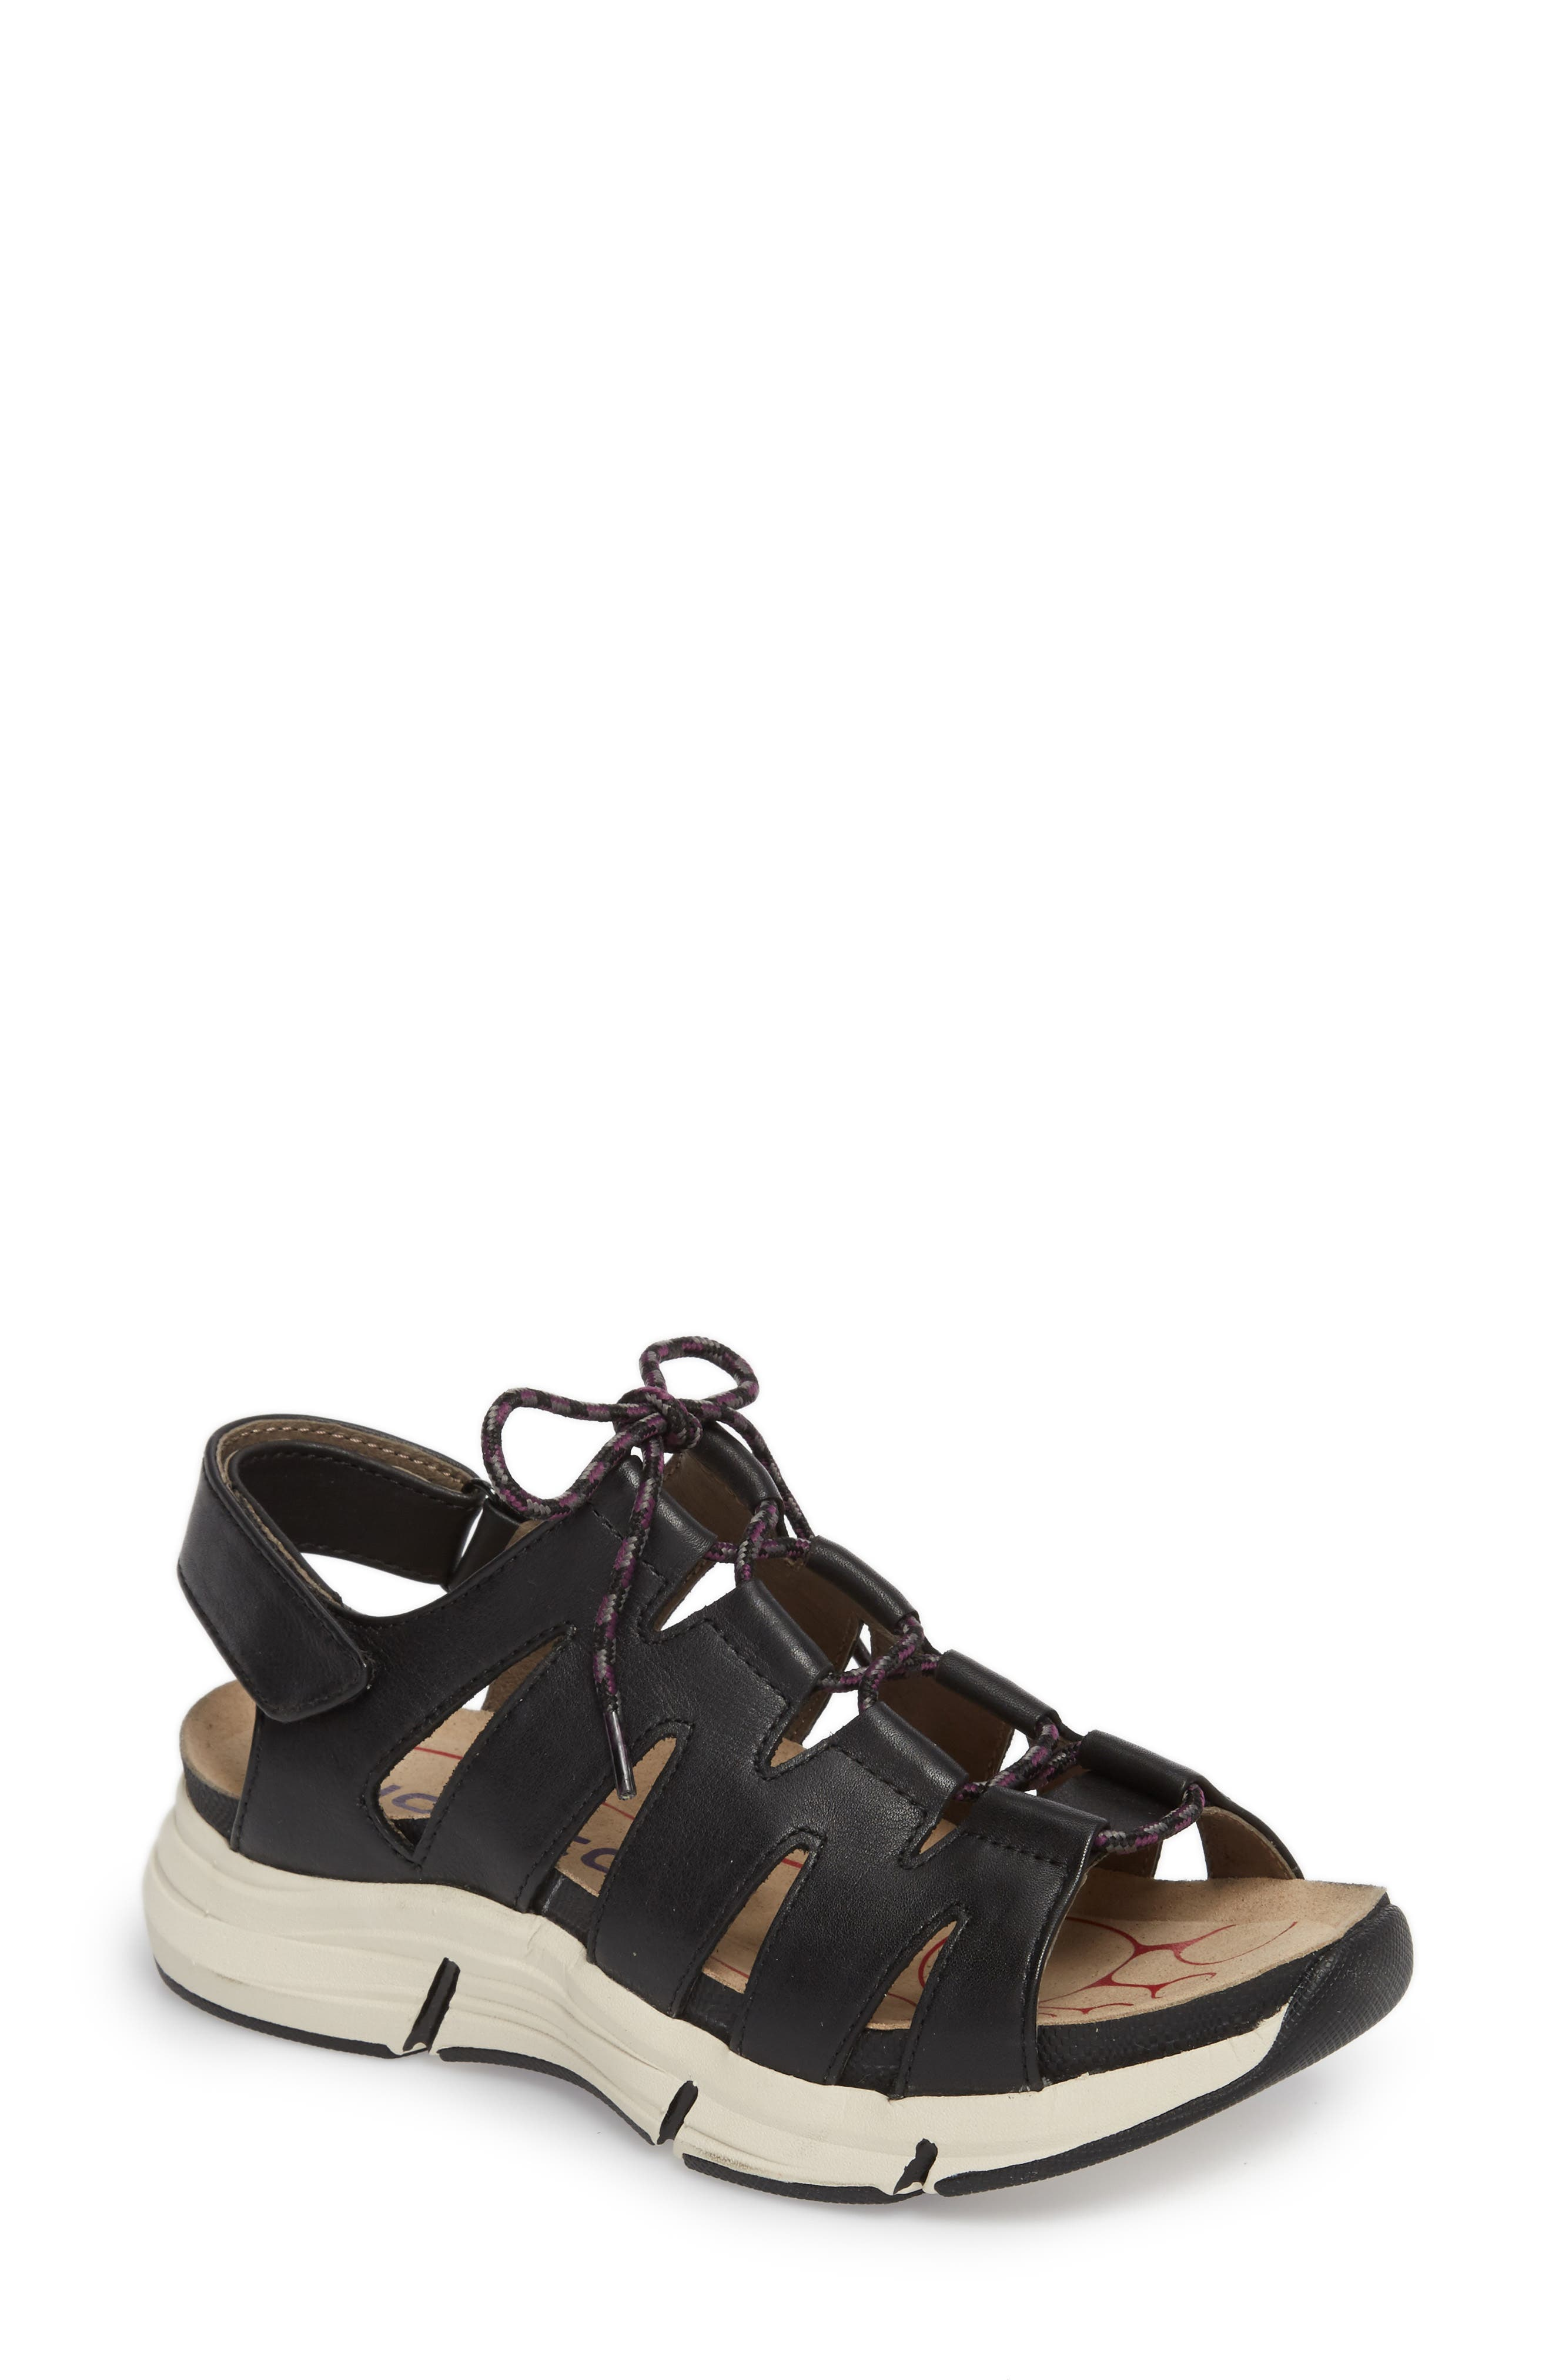 BIONICA Olanda Ghillie Slingback Sandal, Main, color, BLACK LEATHER